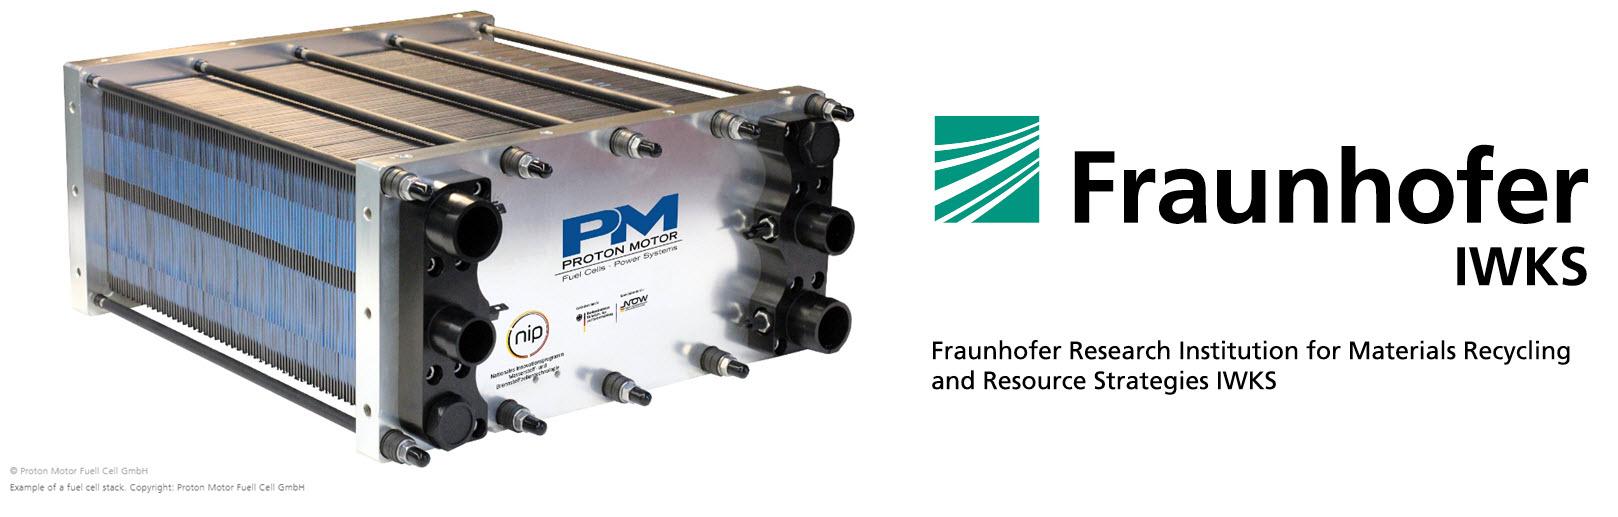 Fraunhofer IWKSMain